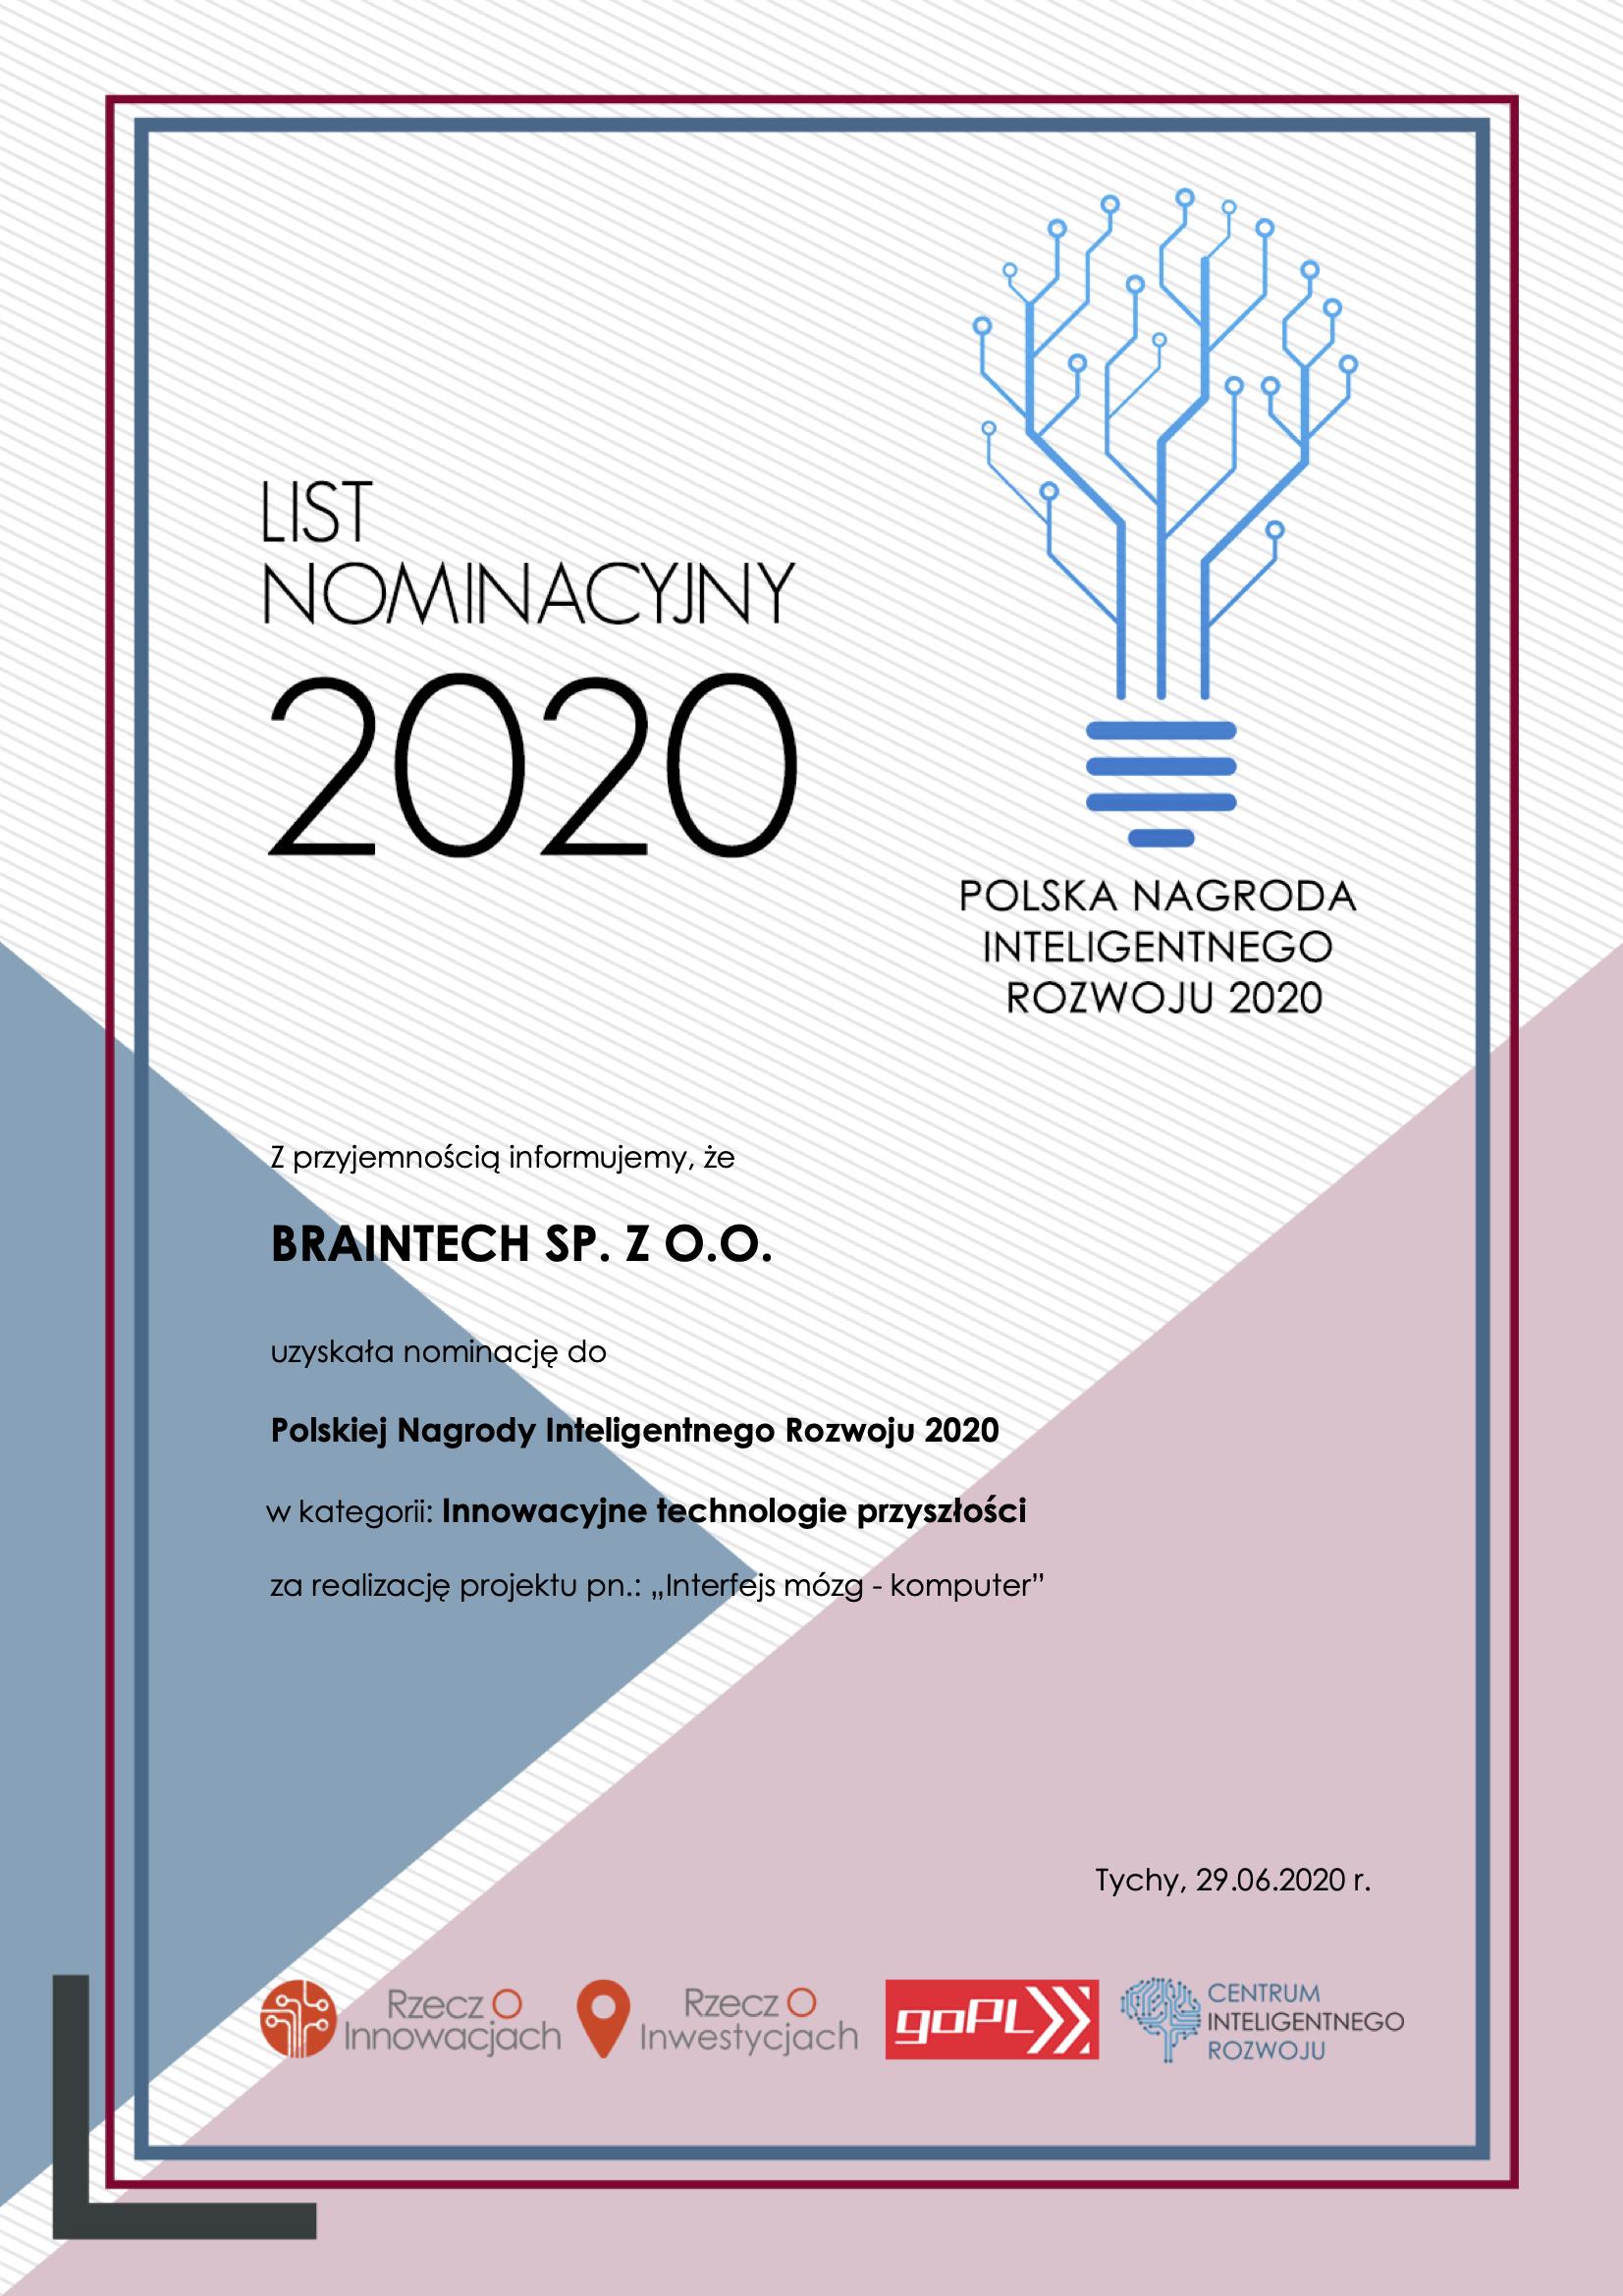 PNIR2020 - List Nominacyjny - Braintech